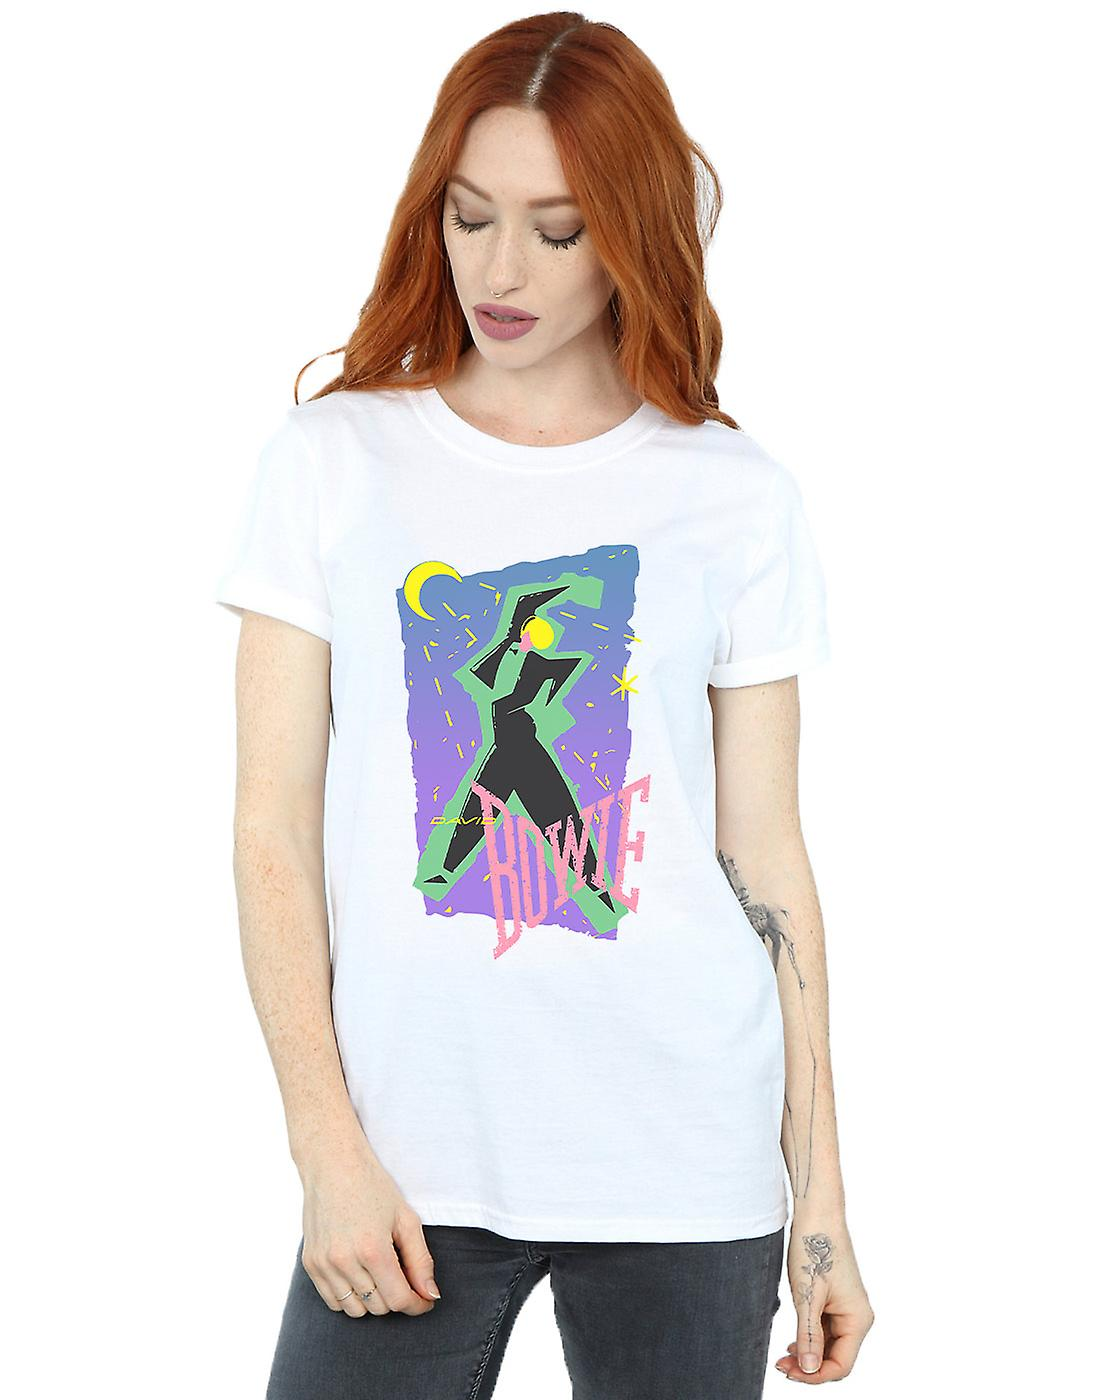 David Bowie Women's Moonlight Dance Boyfriend Fit T-Shirt